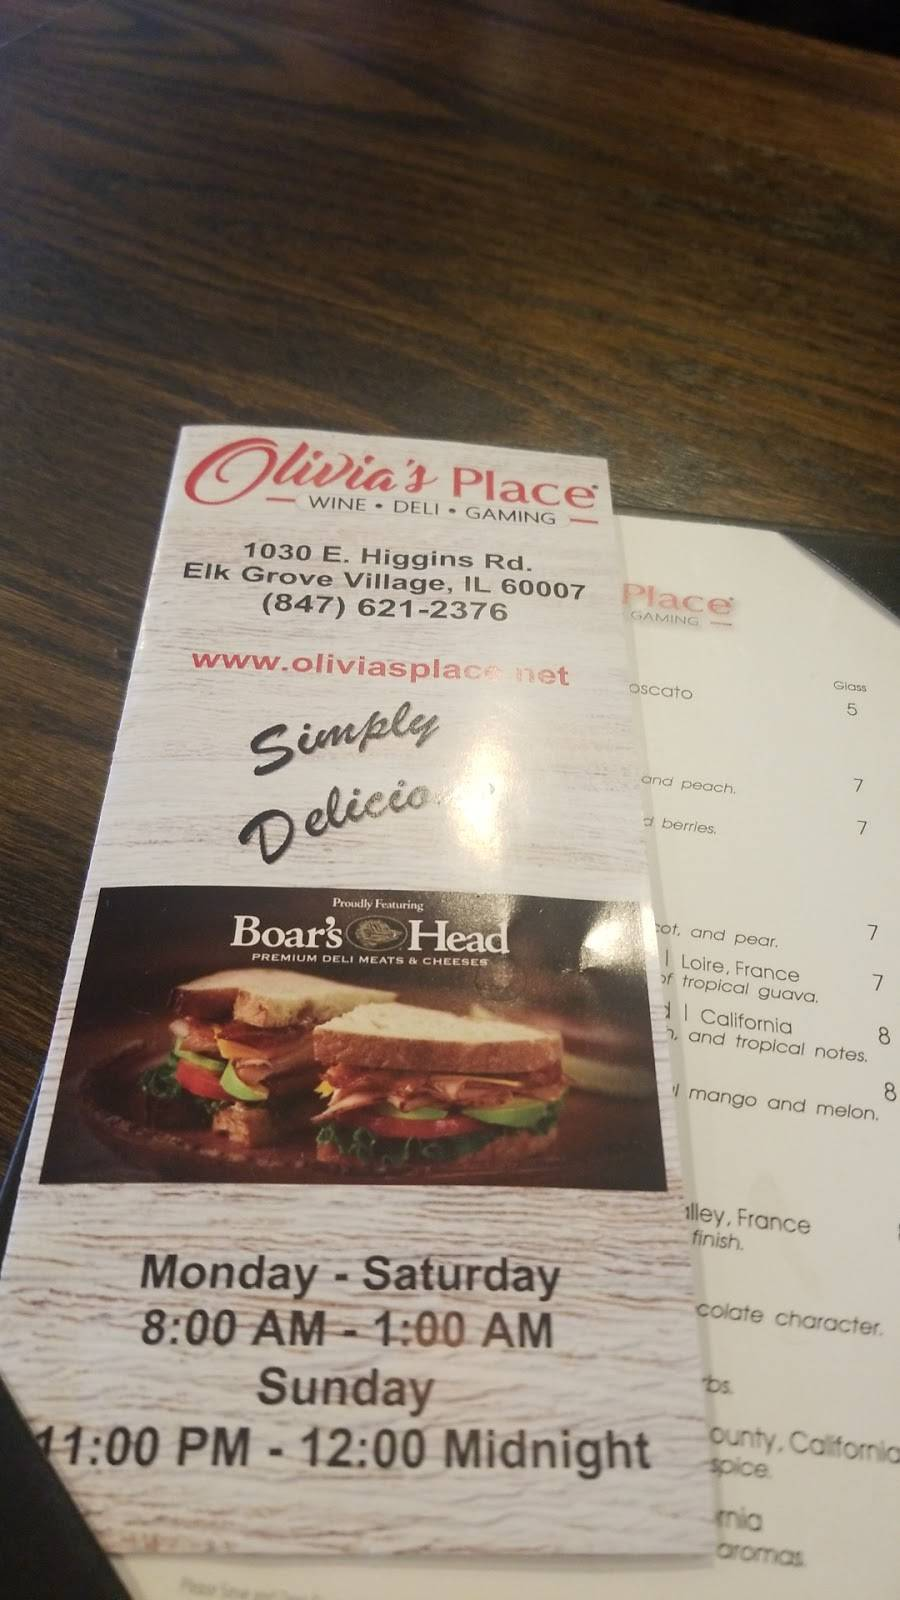 Olivias Place | restaurant | 1030 E Higgins Rd, Elk Grove Village, IL 60007, USA | 8476212376 OR +1 847-621-2376